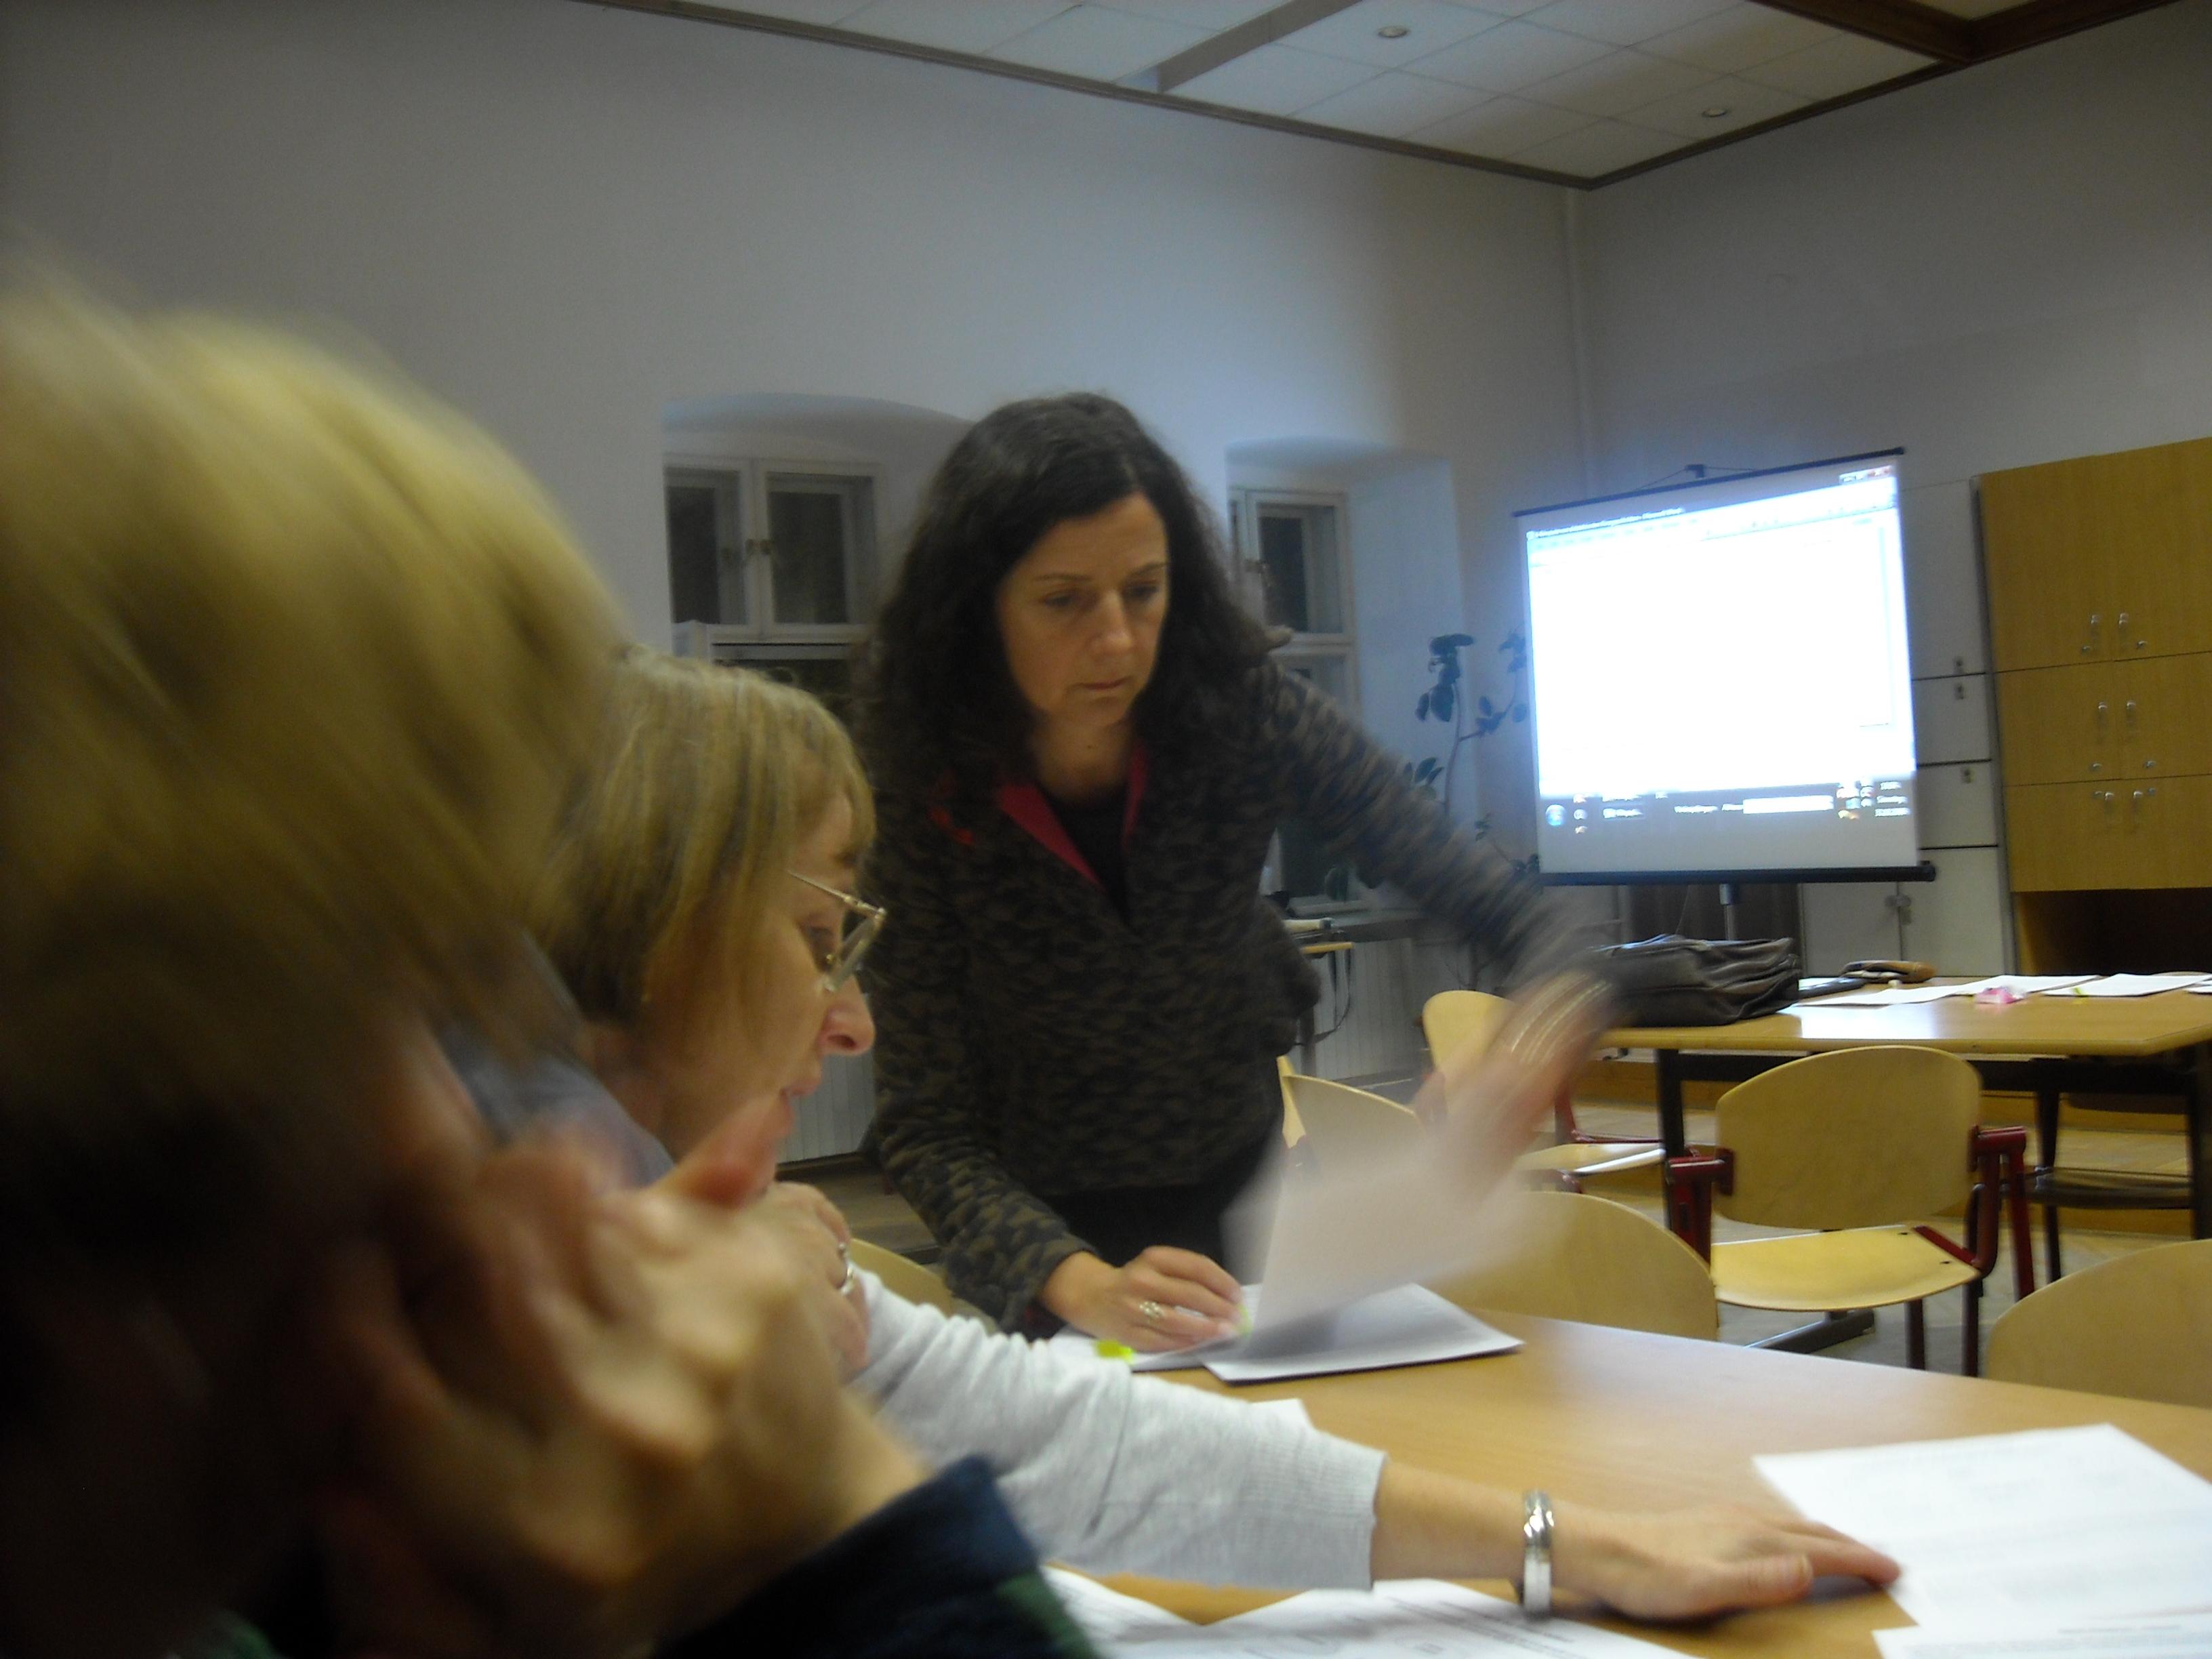 22.Arbeits sequenz, Dr. Gabriela Cordemans, Progr